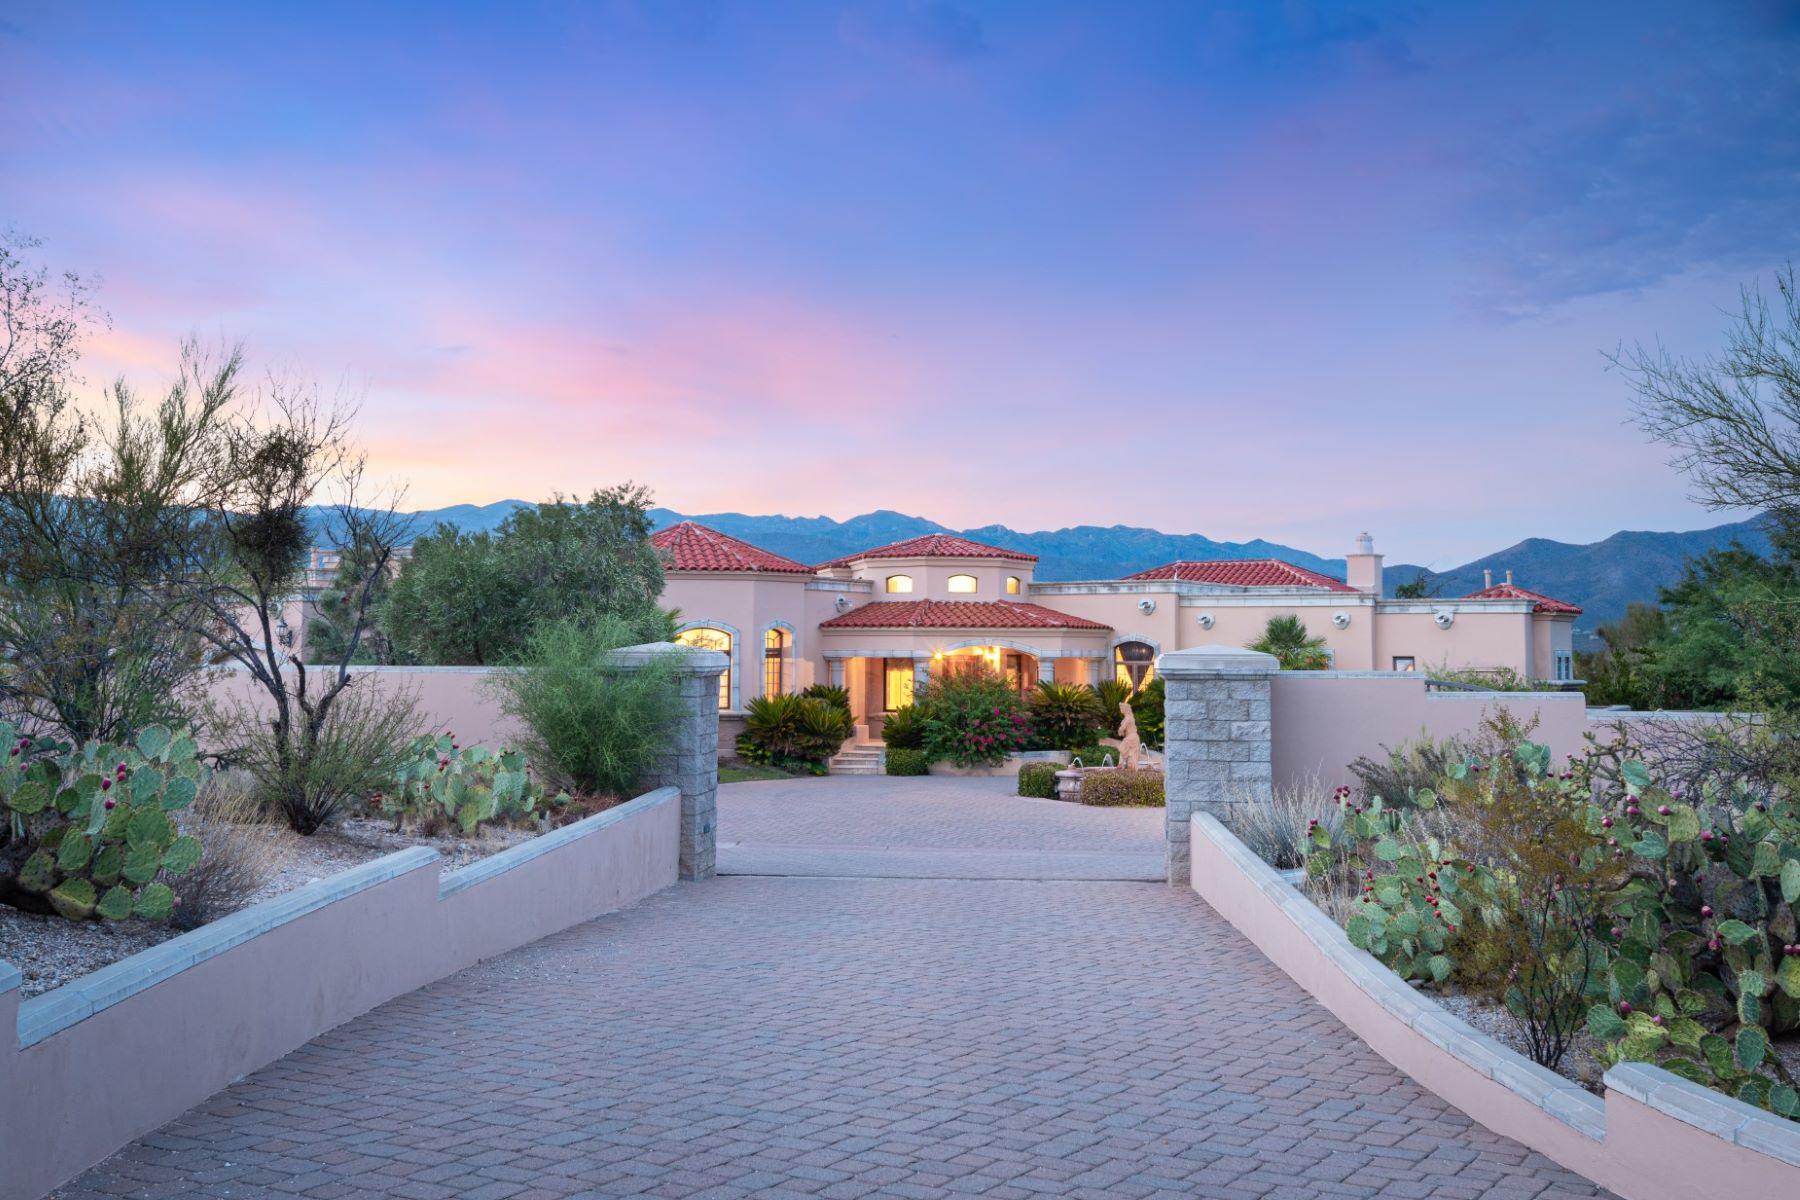 Single Family Homes for Sale at Beautiful Mediterranean Estate on a 3.3 Acre Lot 11601 E Lusitano Place Tucson, Arizona 85748 United States